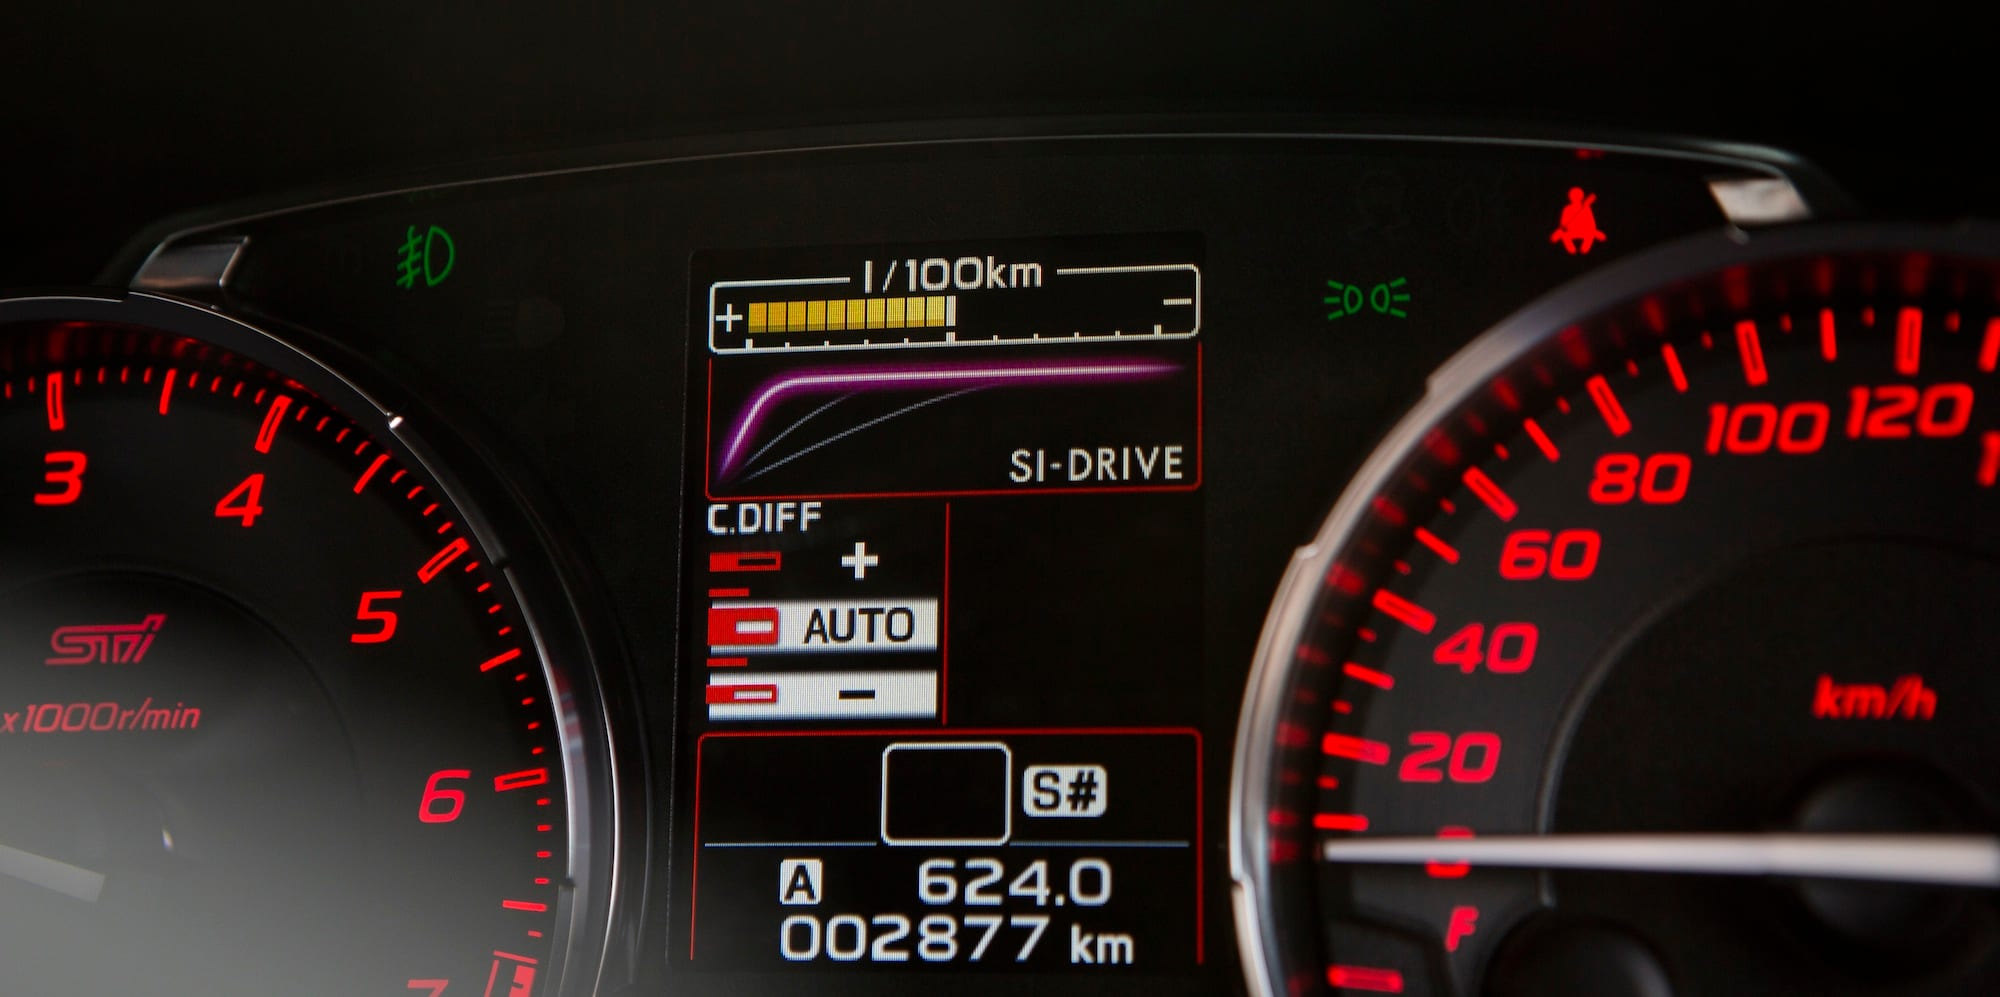 Subaru WRX STI Audi S3 Volkswagen Golf R 37